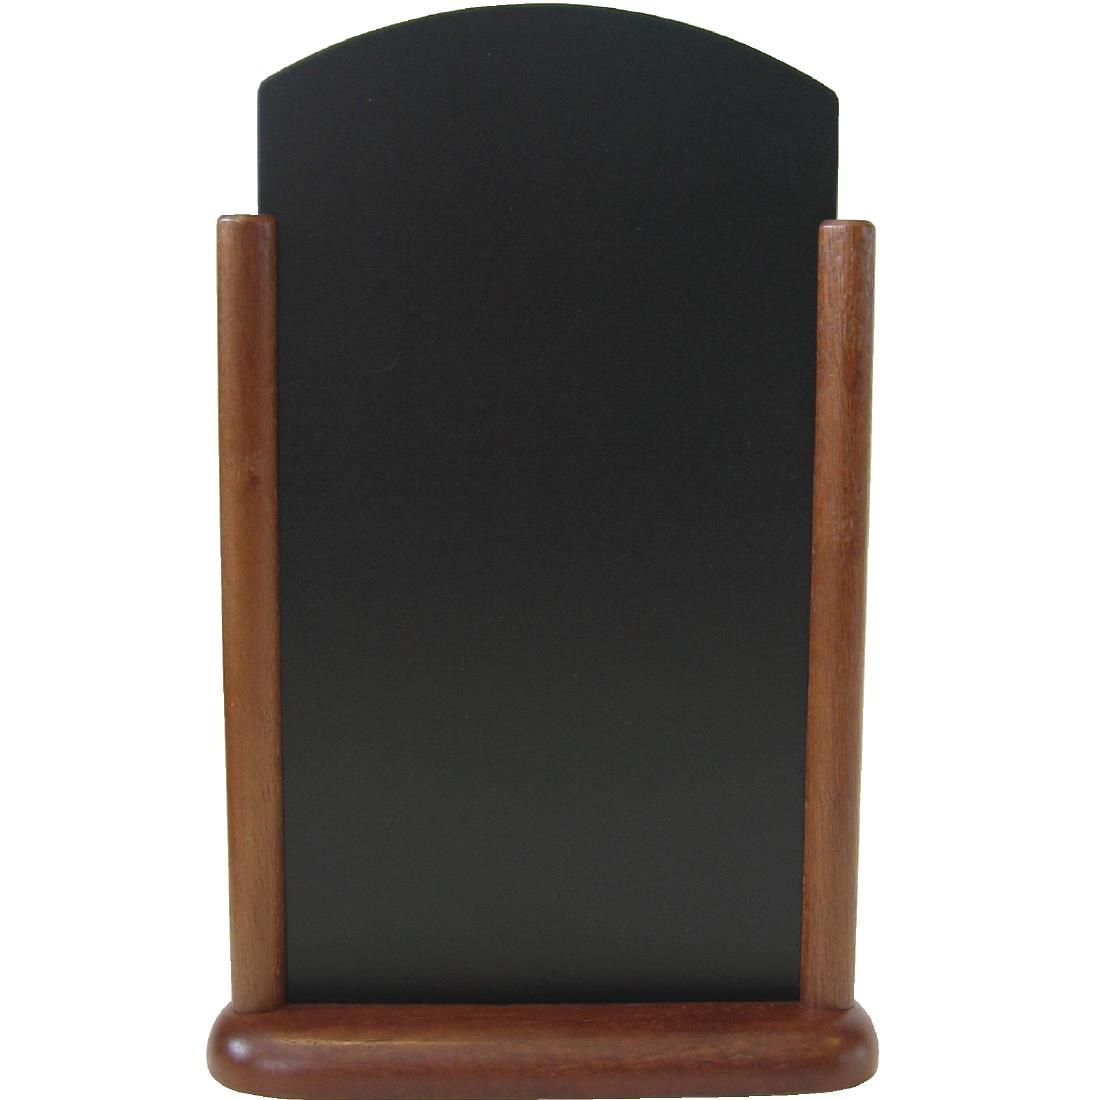 Securit Pillared Table Top Blackboard Mahogany